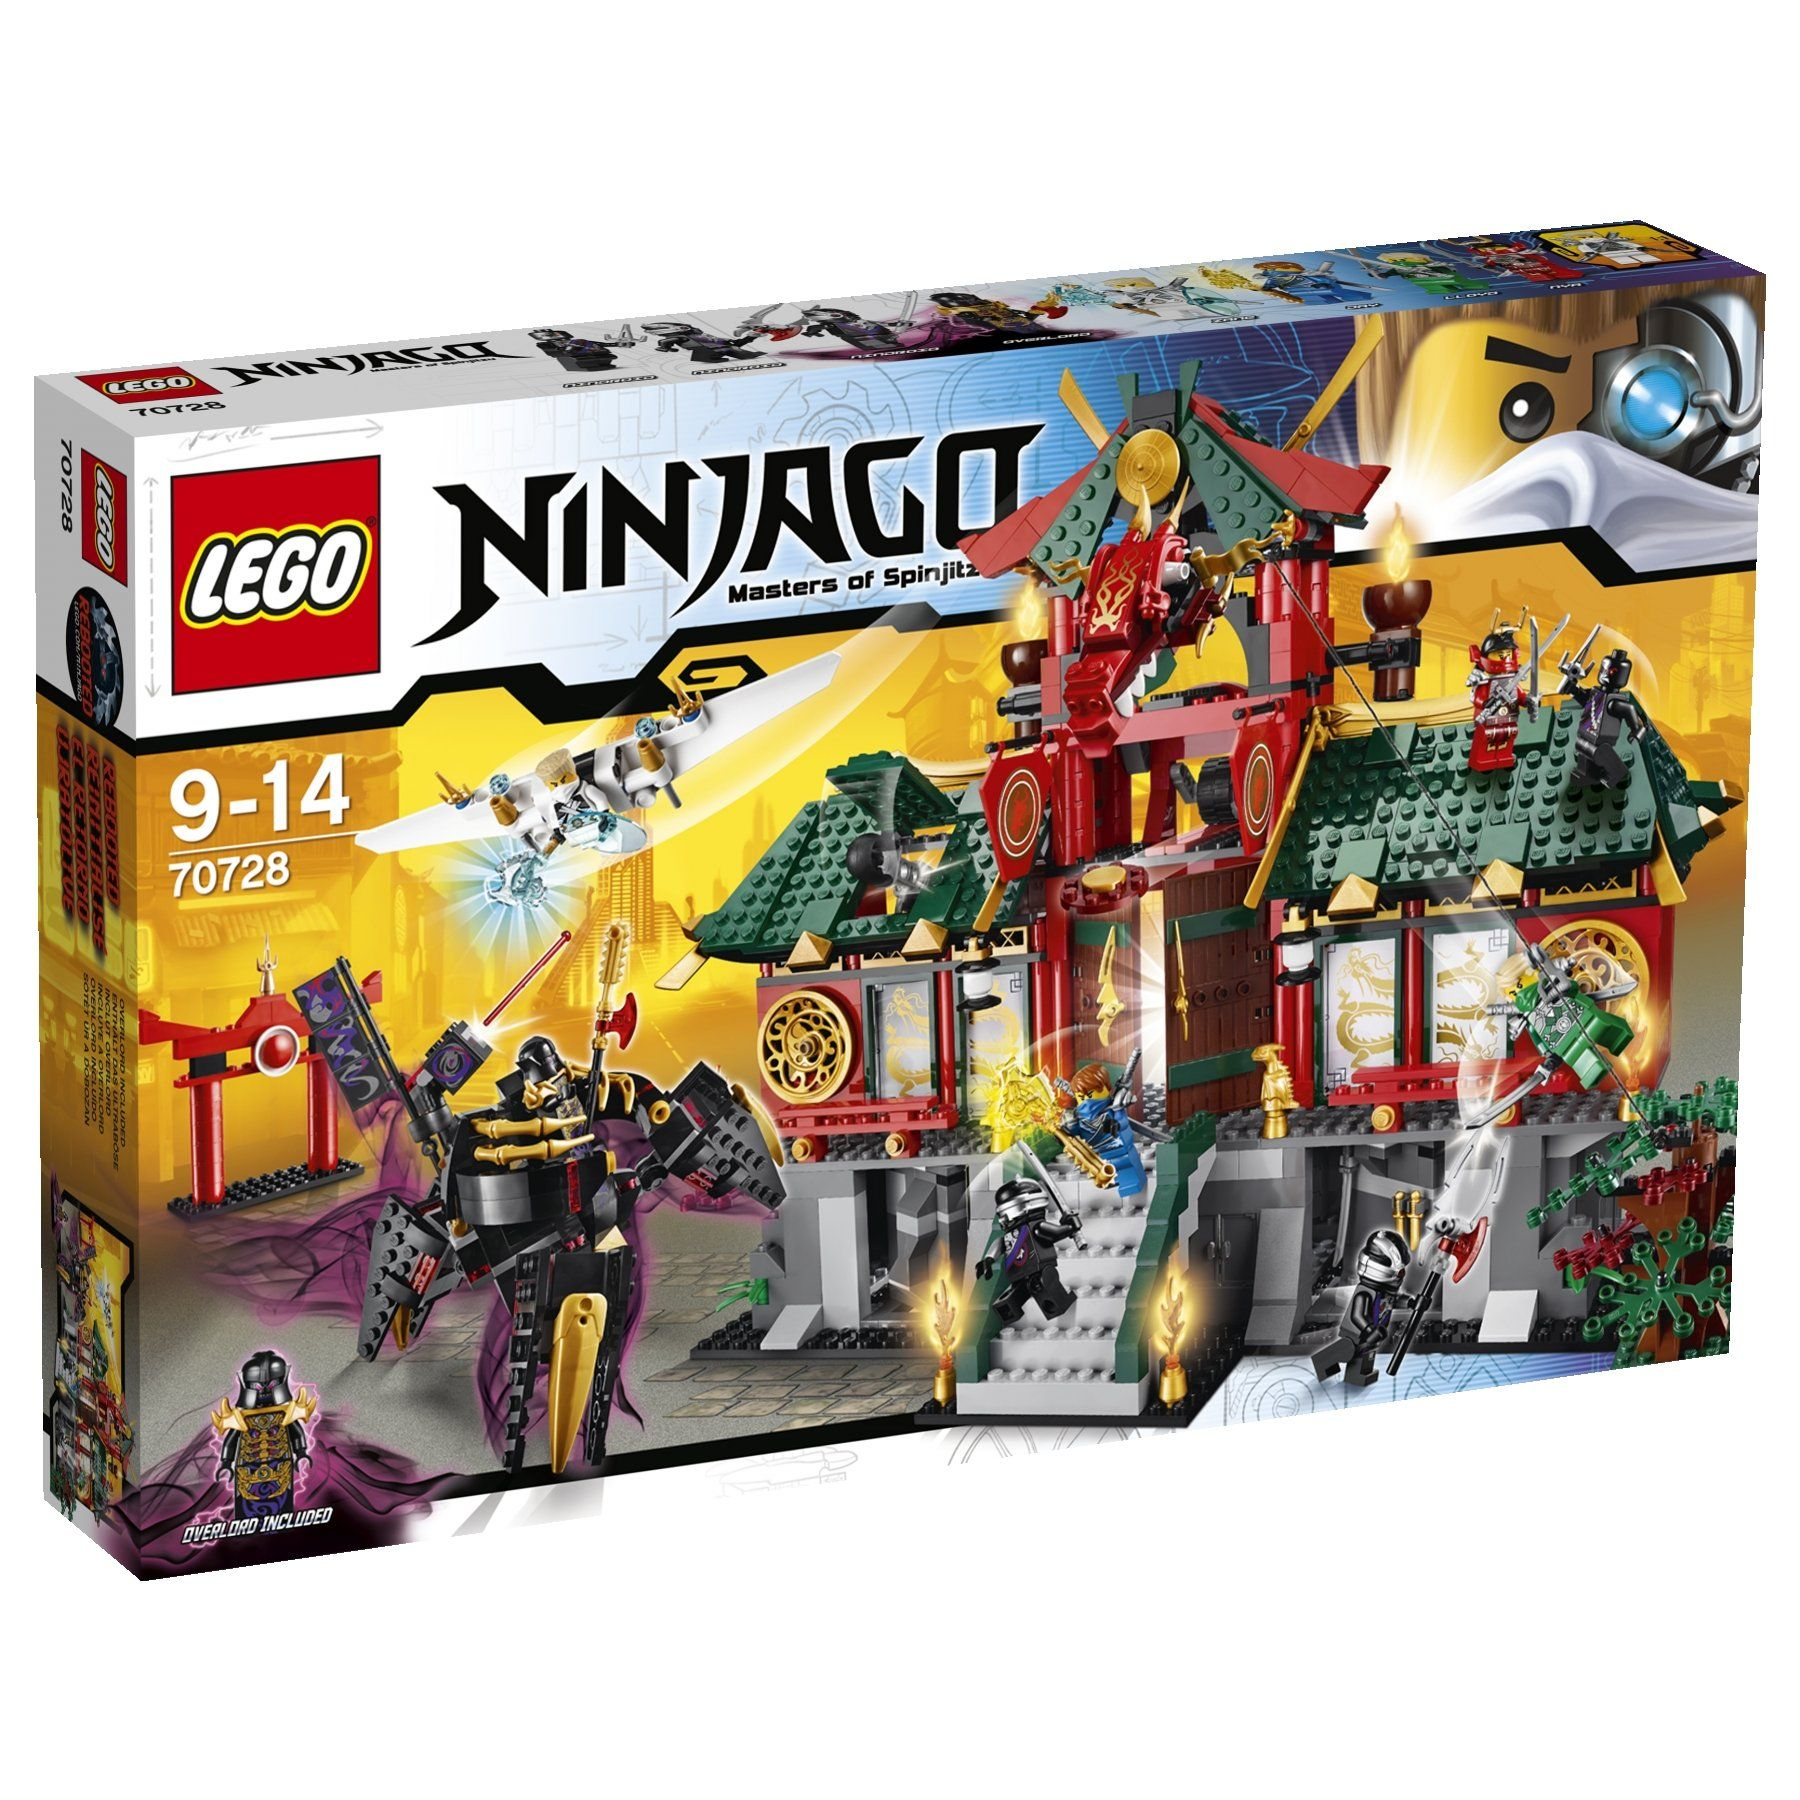 Le 70728 Temple Playthèmes Construction Lego Jeu De Ninjago nymN8wOv0